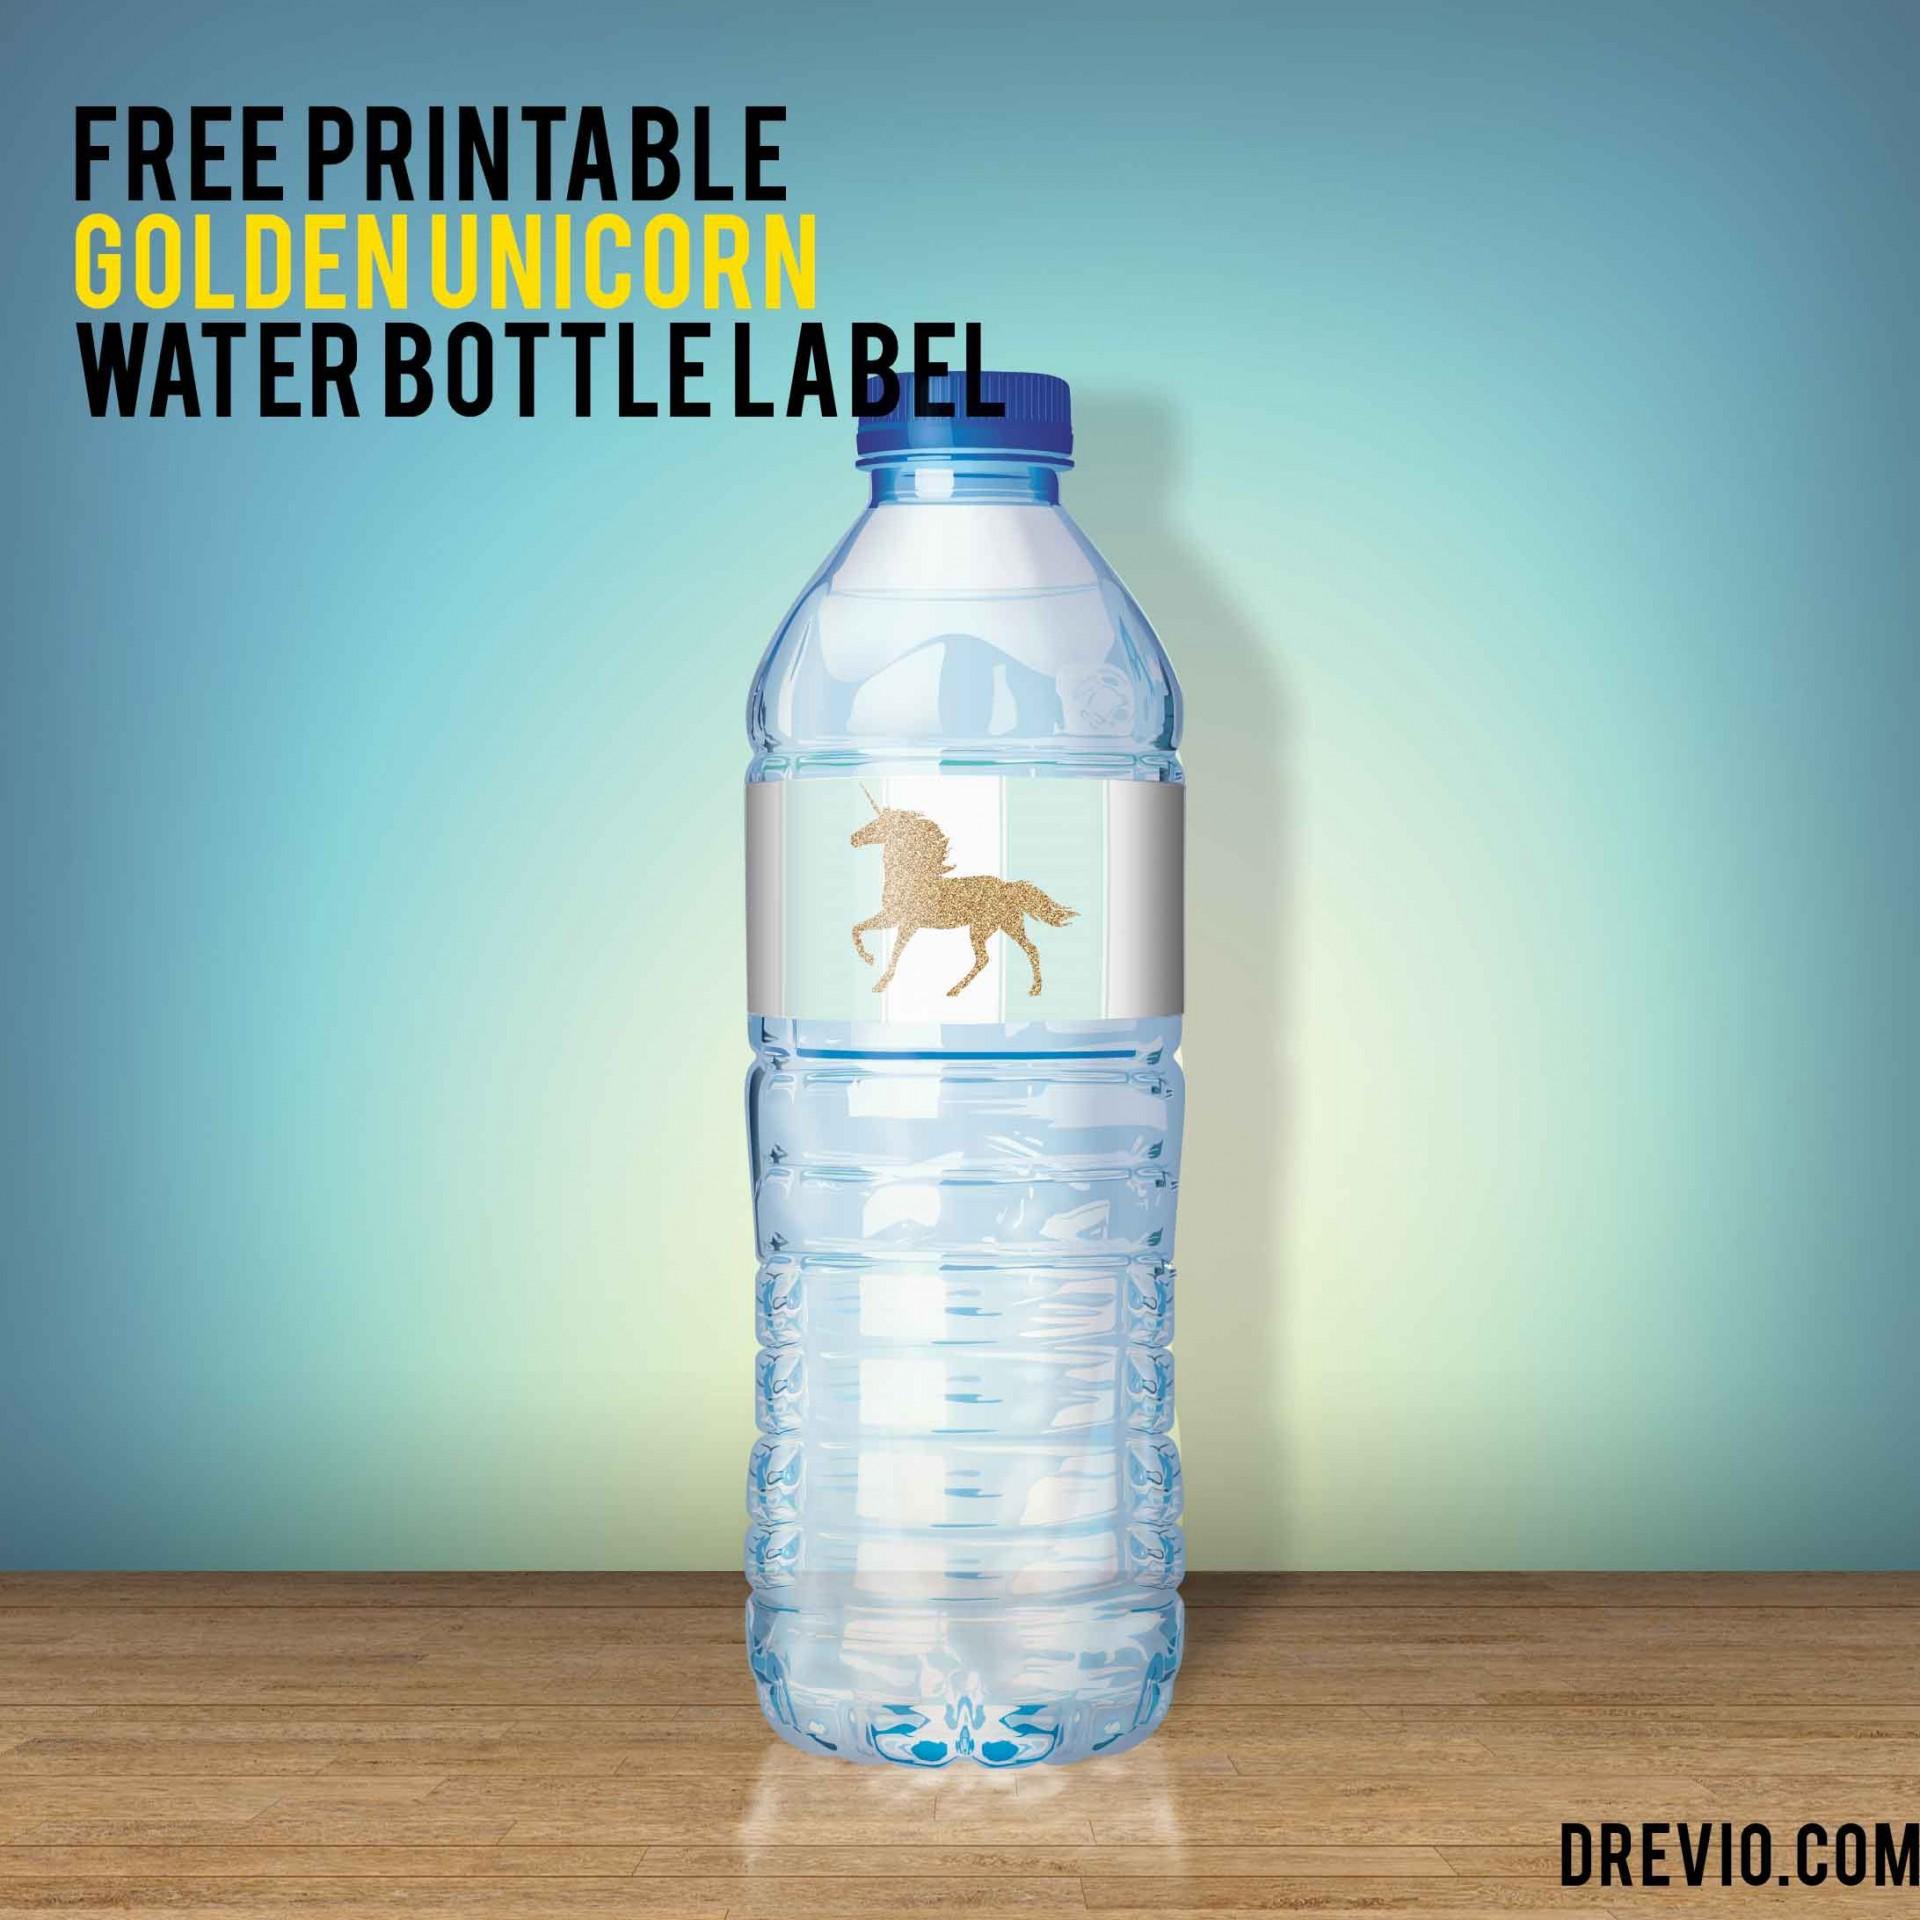 005 Fantastic Bottle Label Template Free Design  Mini Wine Water Birthday Champagne Download1920